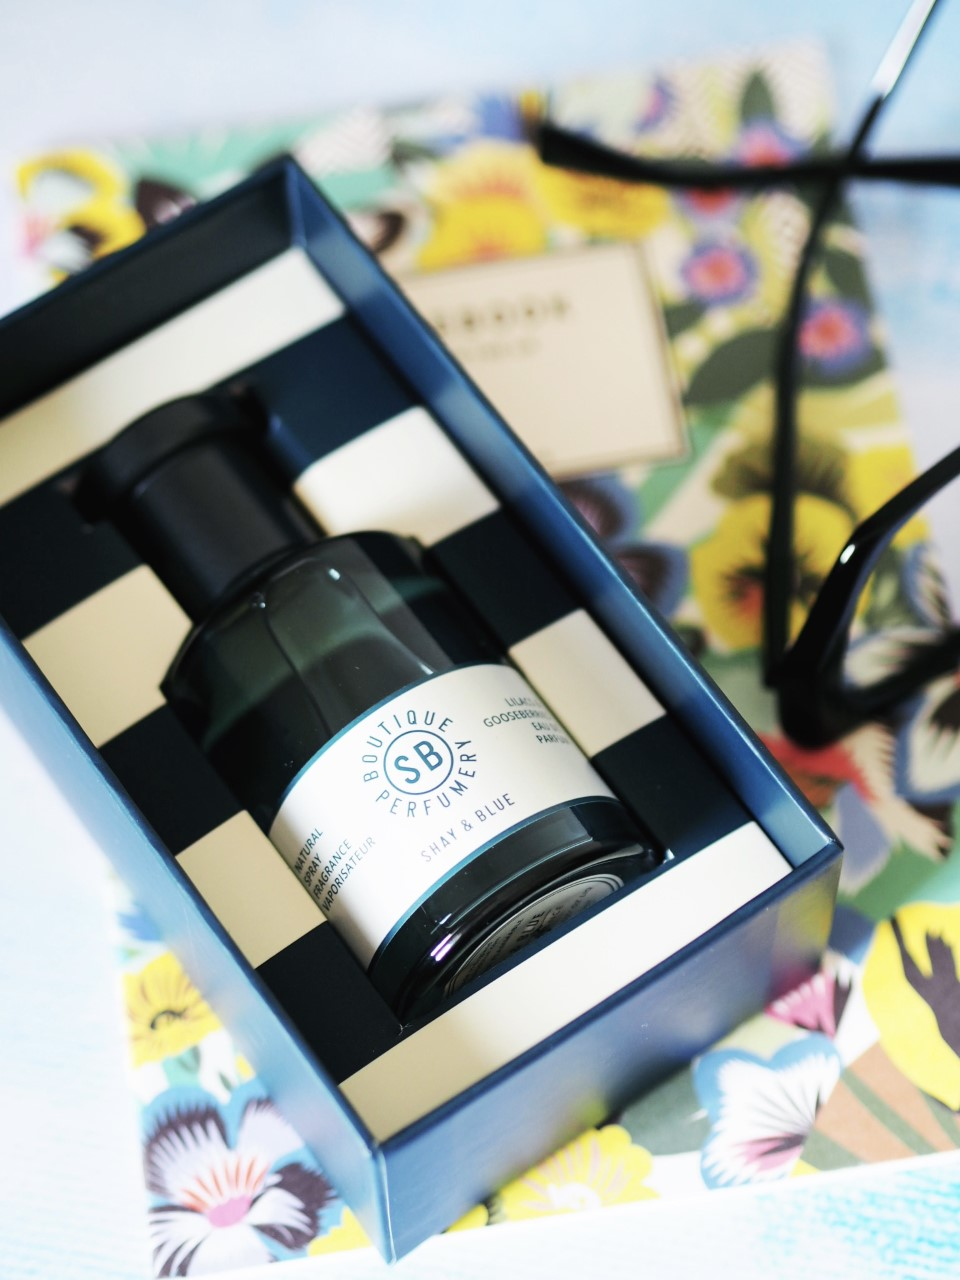 Shay & Blue 'Lilacs & Gooseberries' Perfume